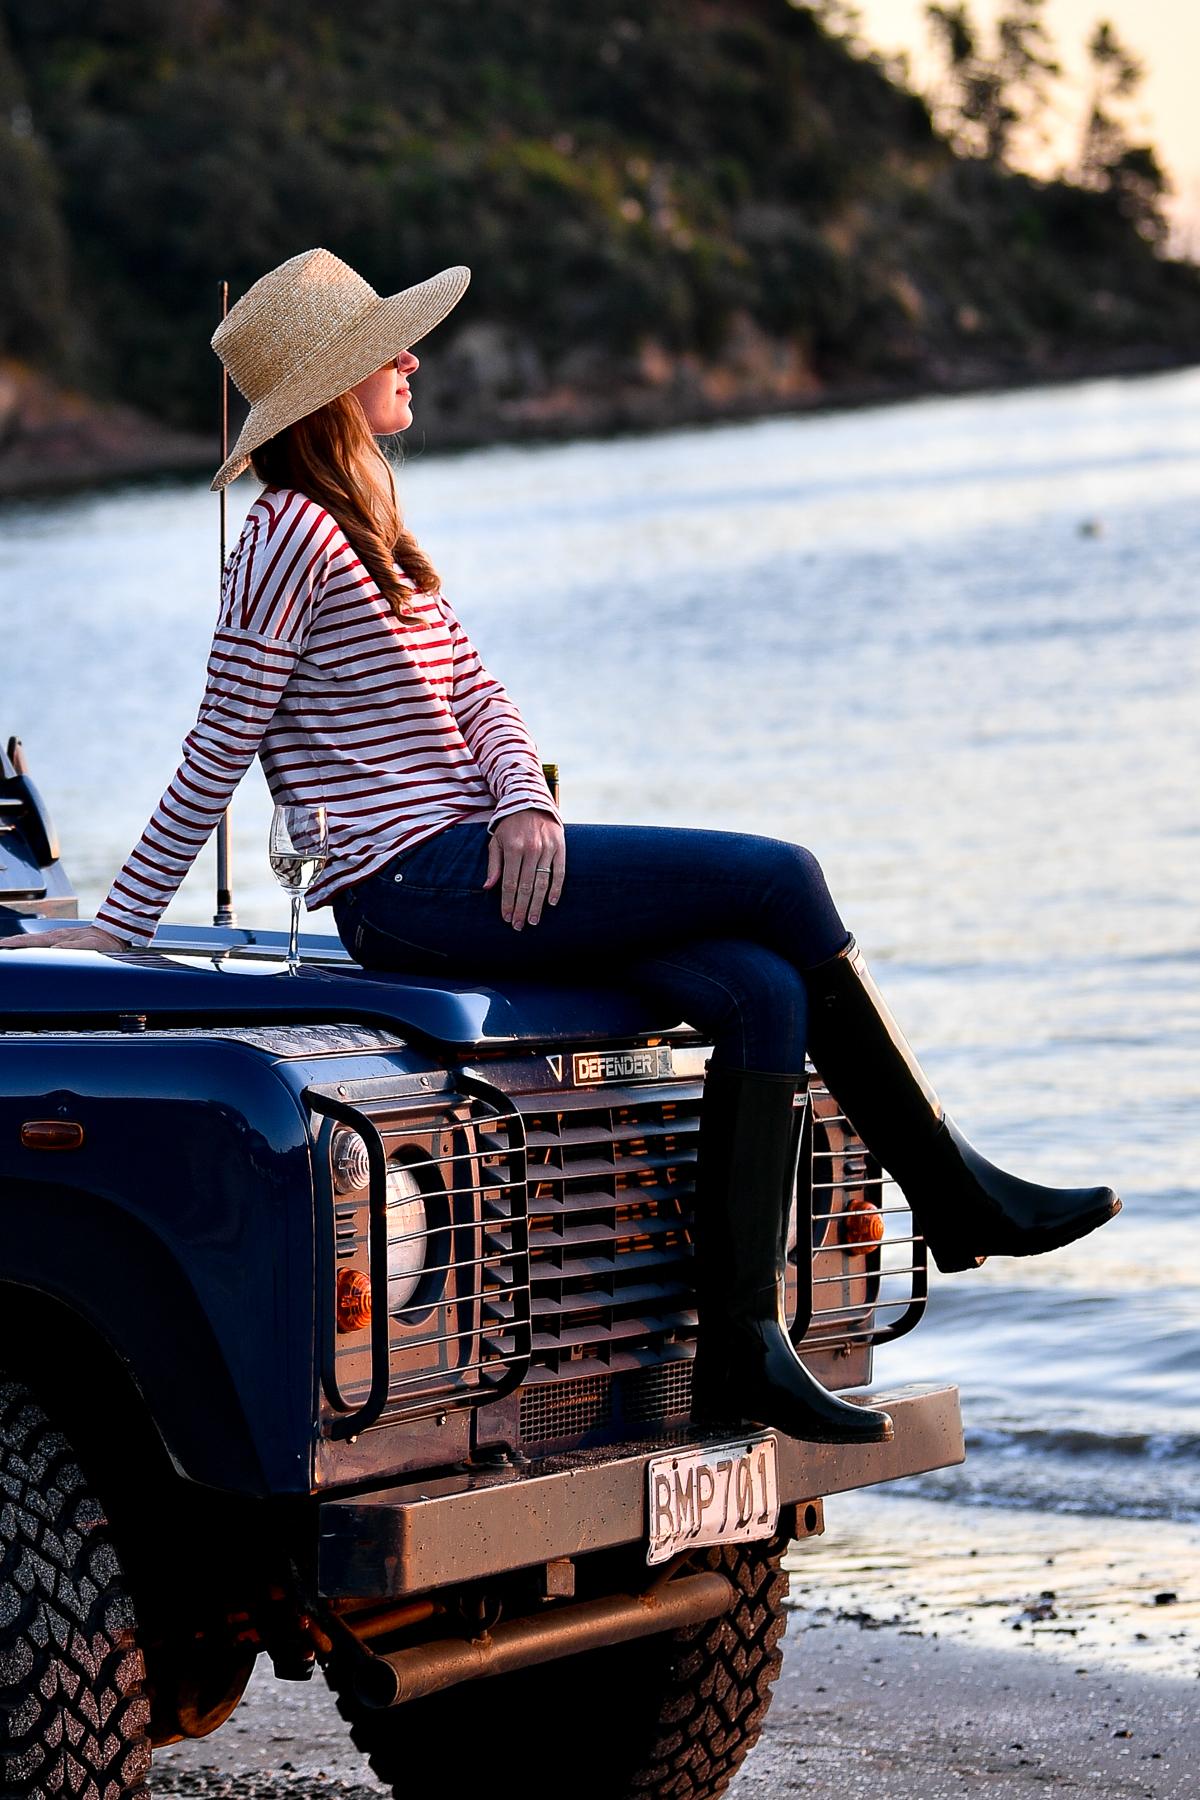 Stacie Flinner Land Rover Camping New Zealand-26.jpg